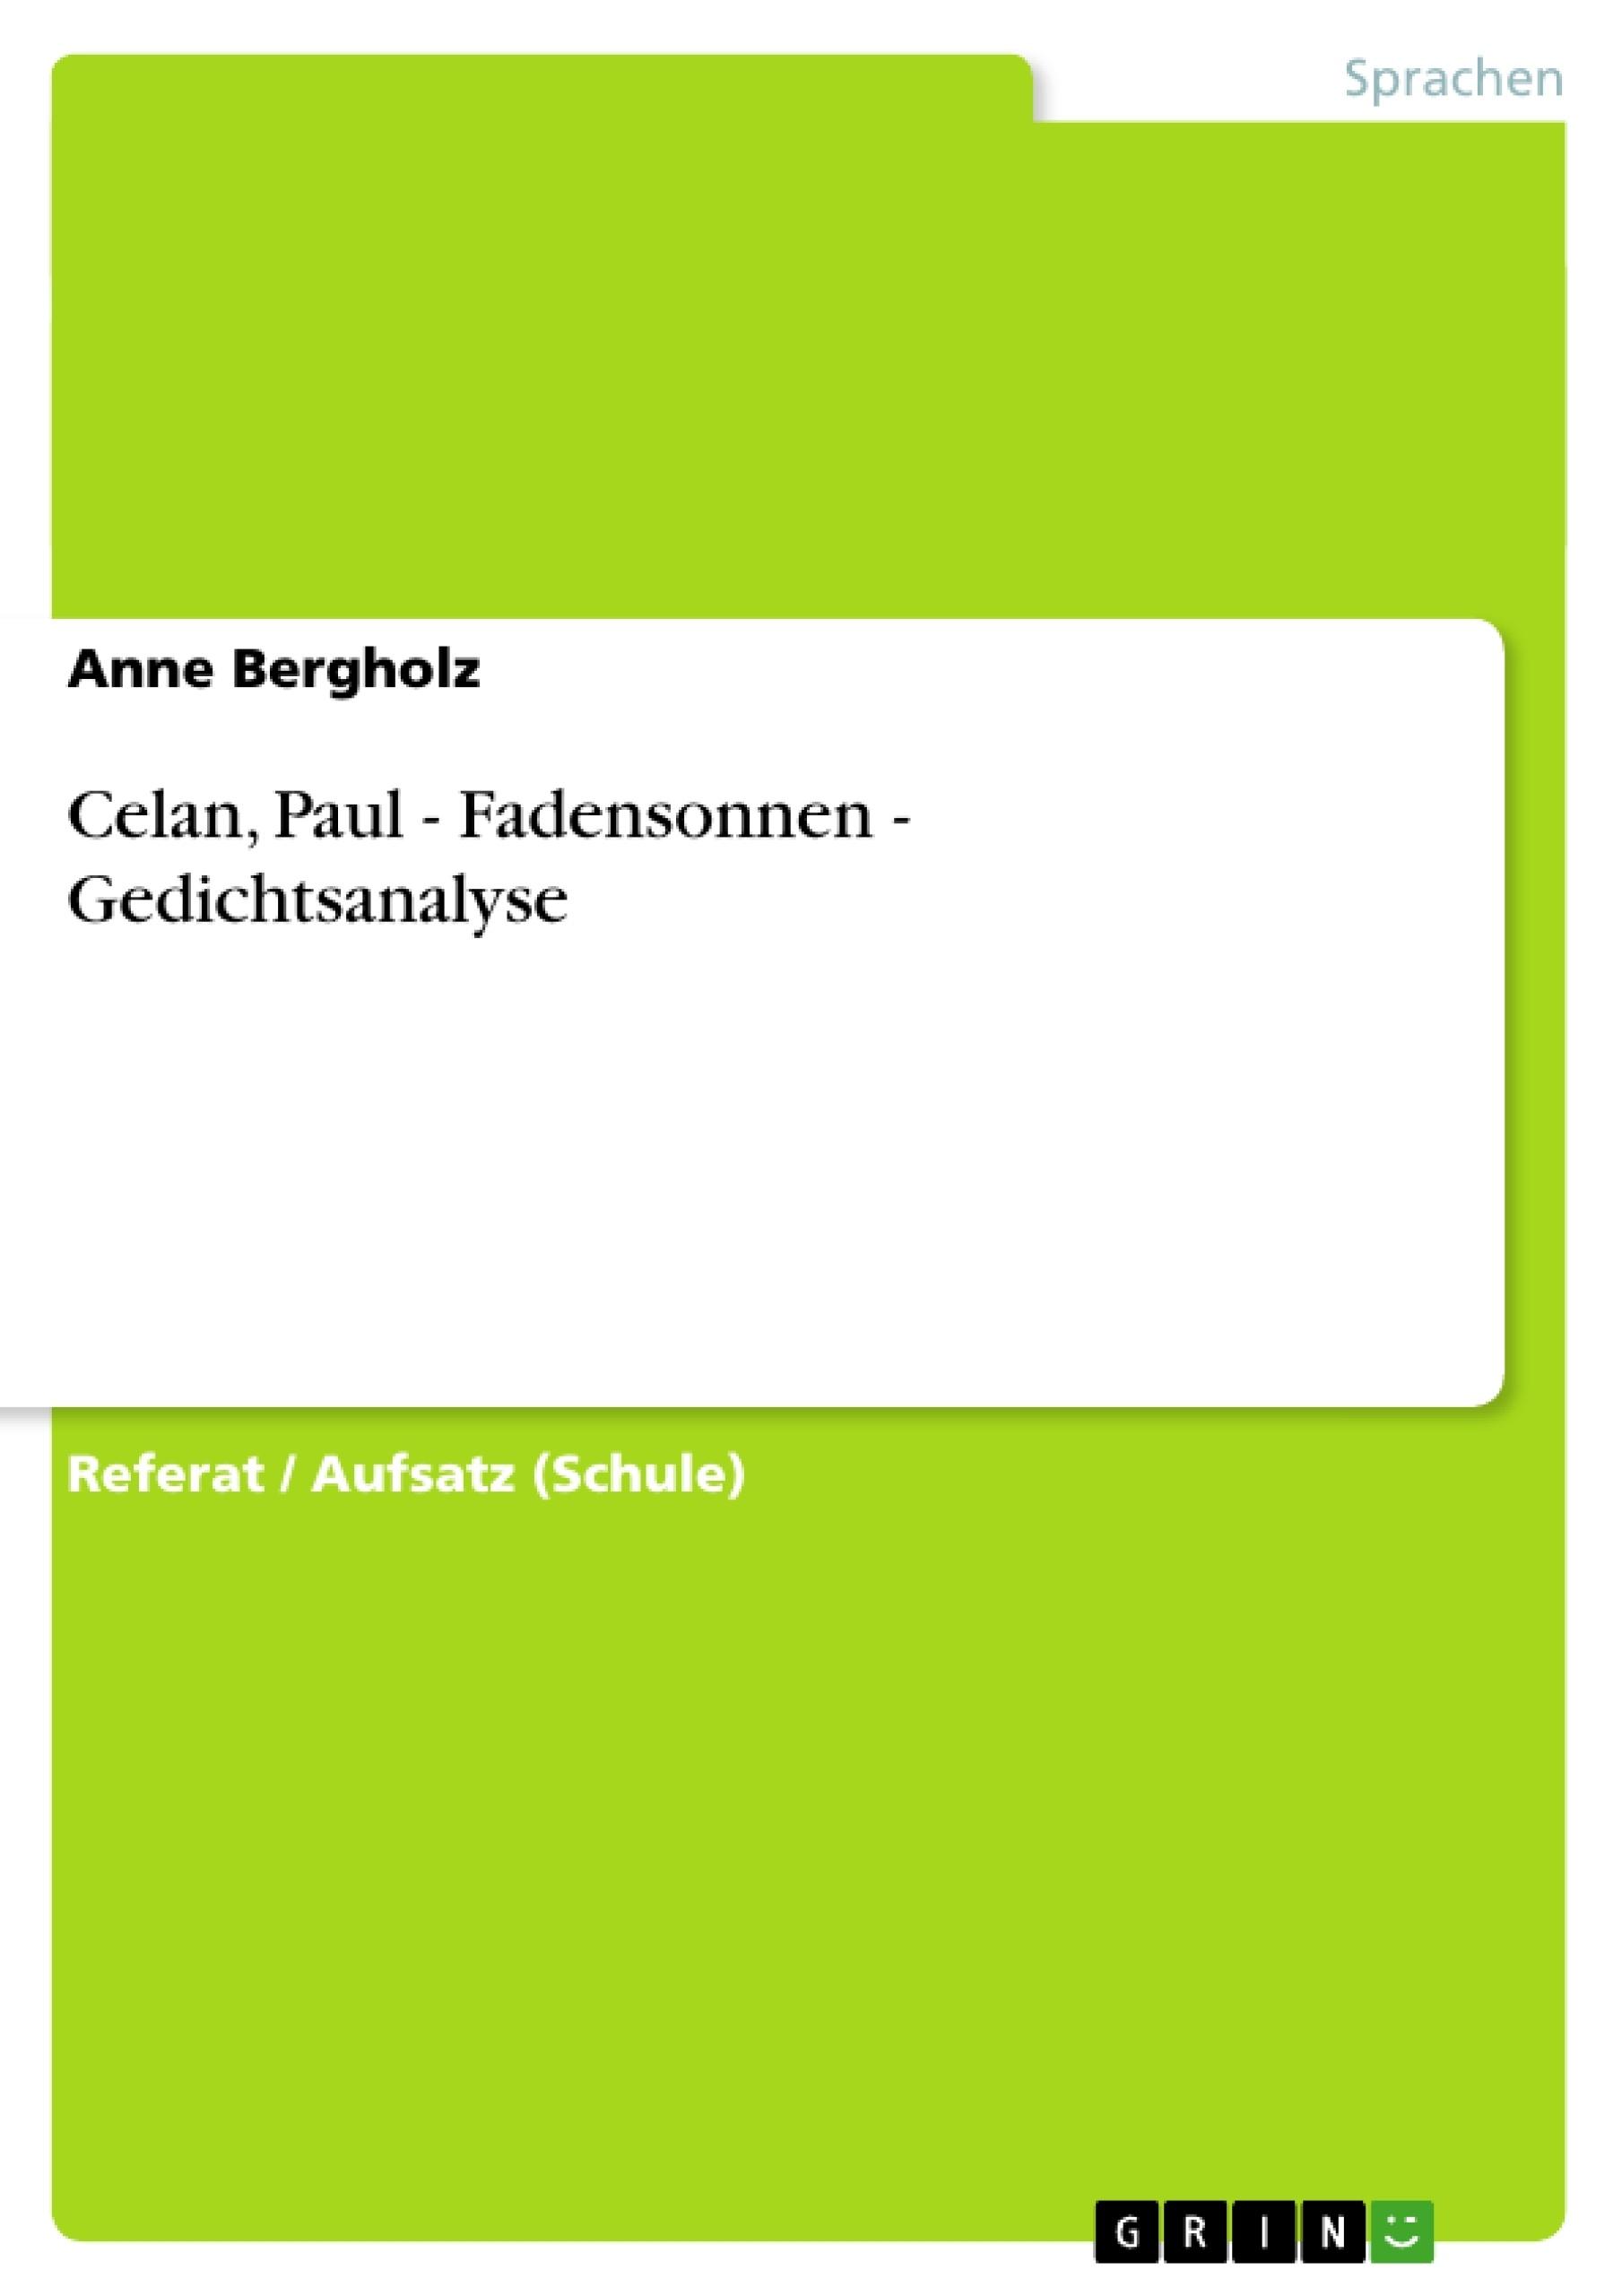 Titel: Celan, Paul - Fadensonnen - Gedichtsanalyse